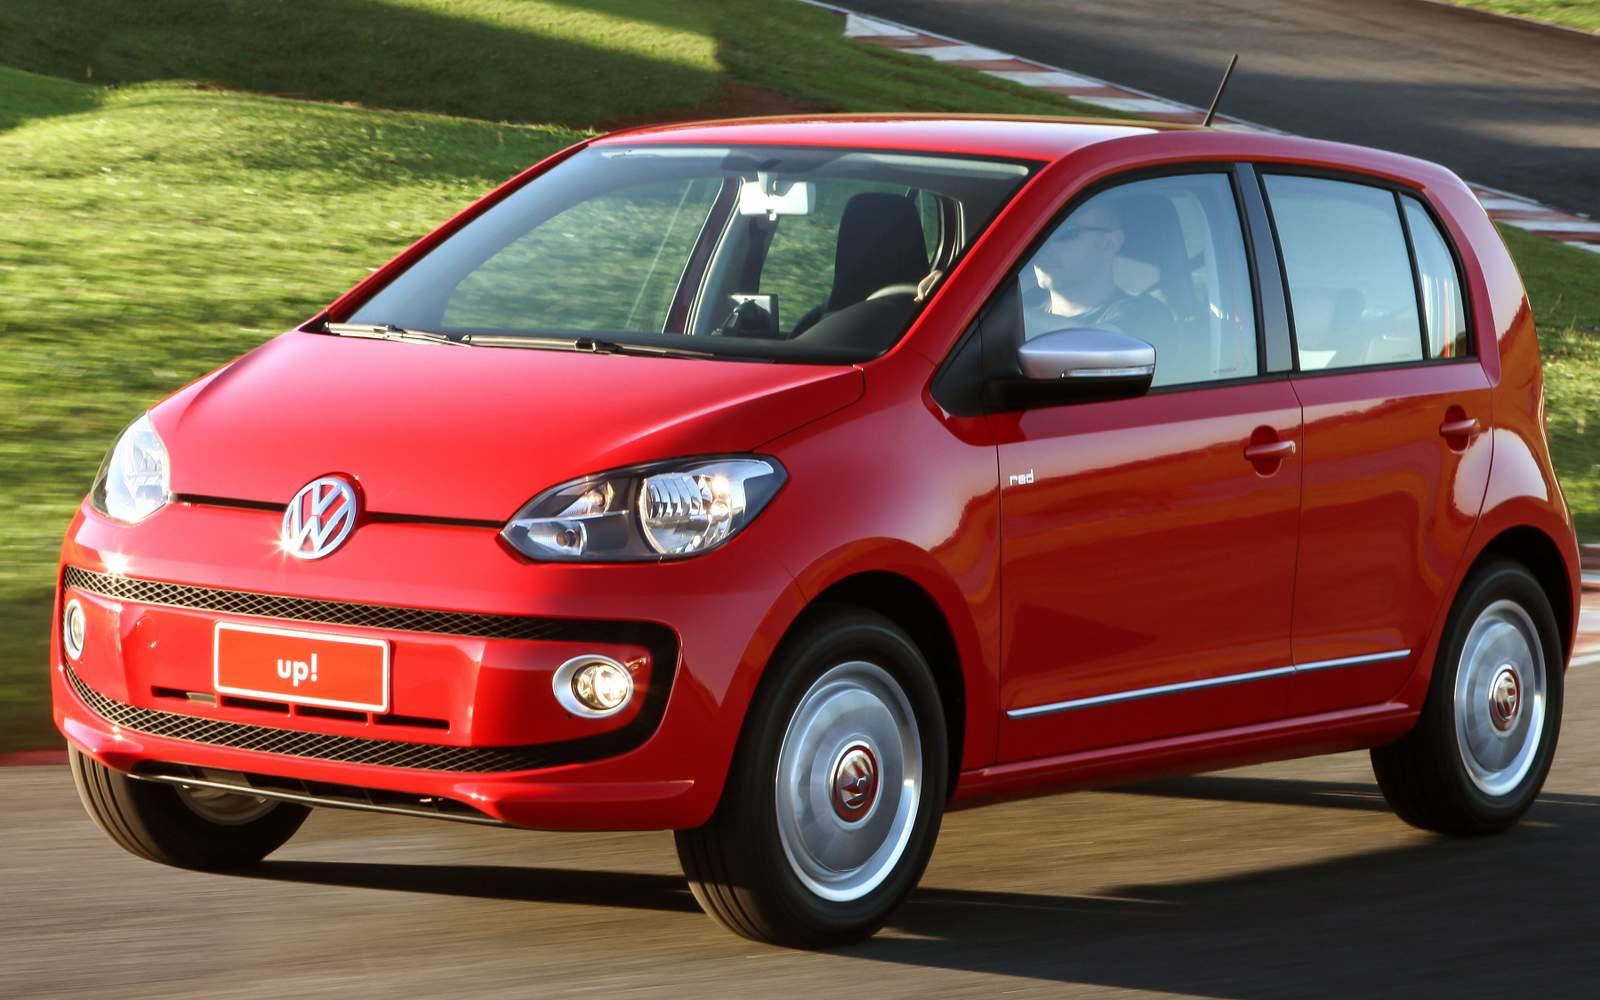 Volkswagen up! 2015 - vendas em alta